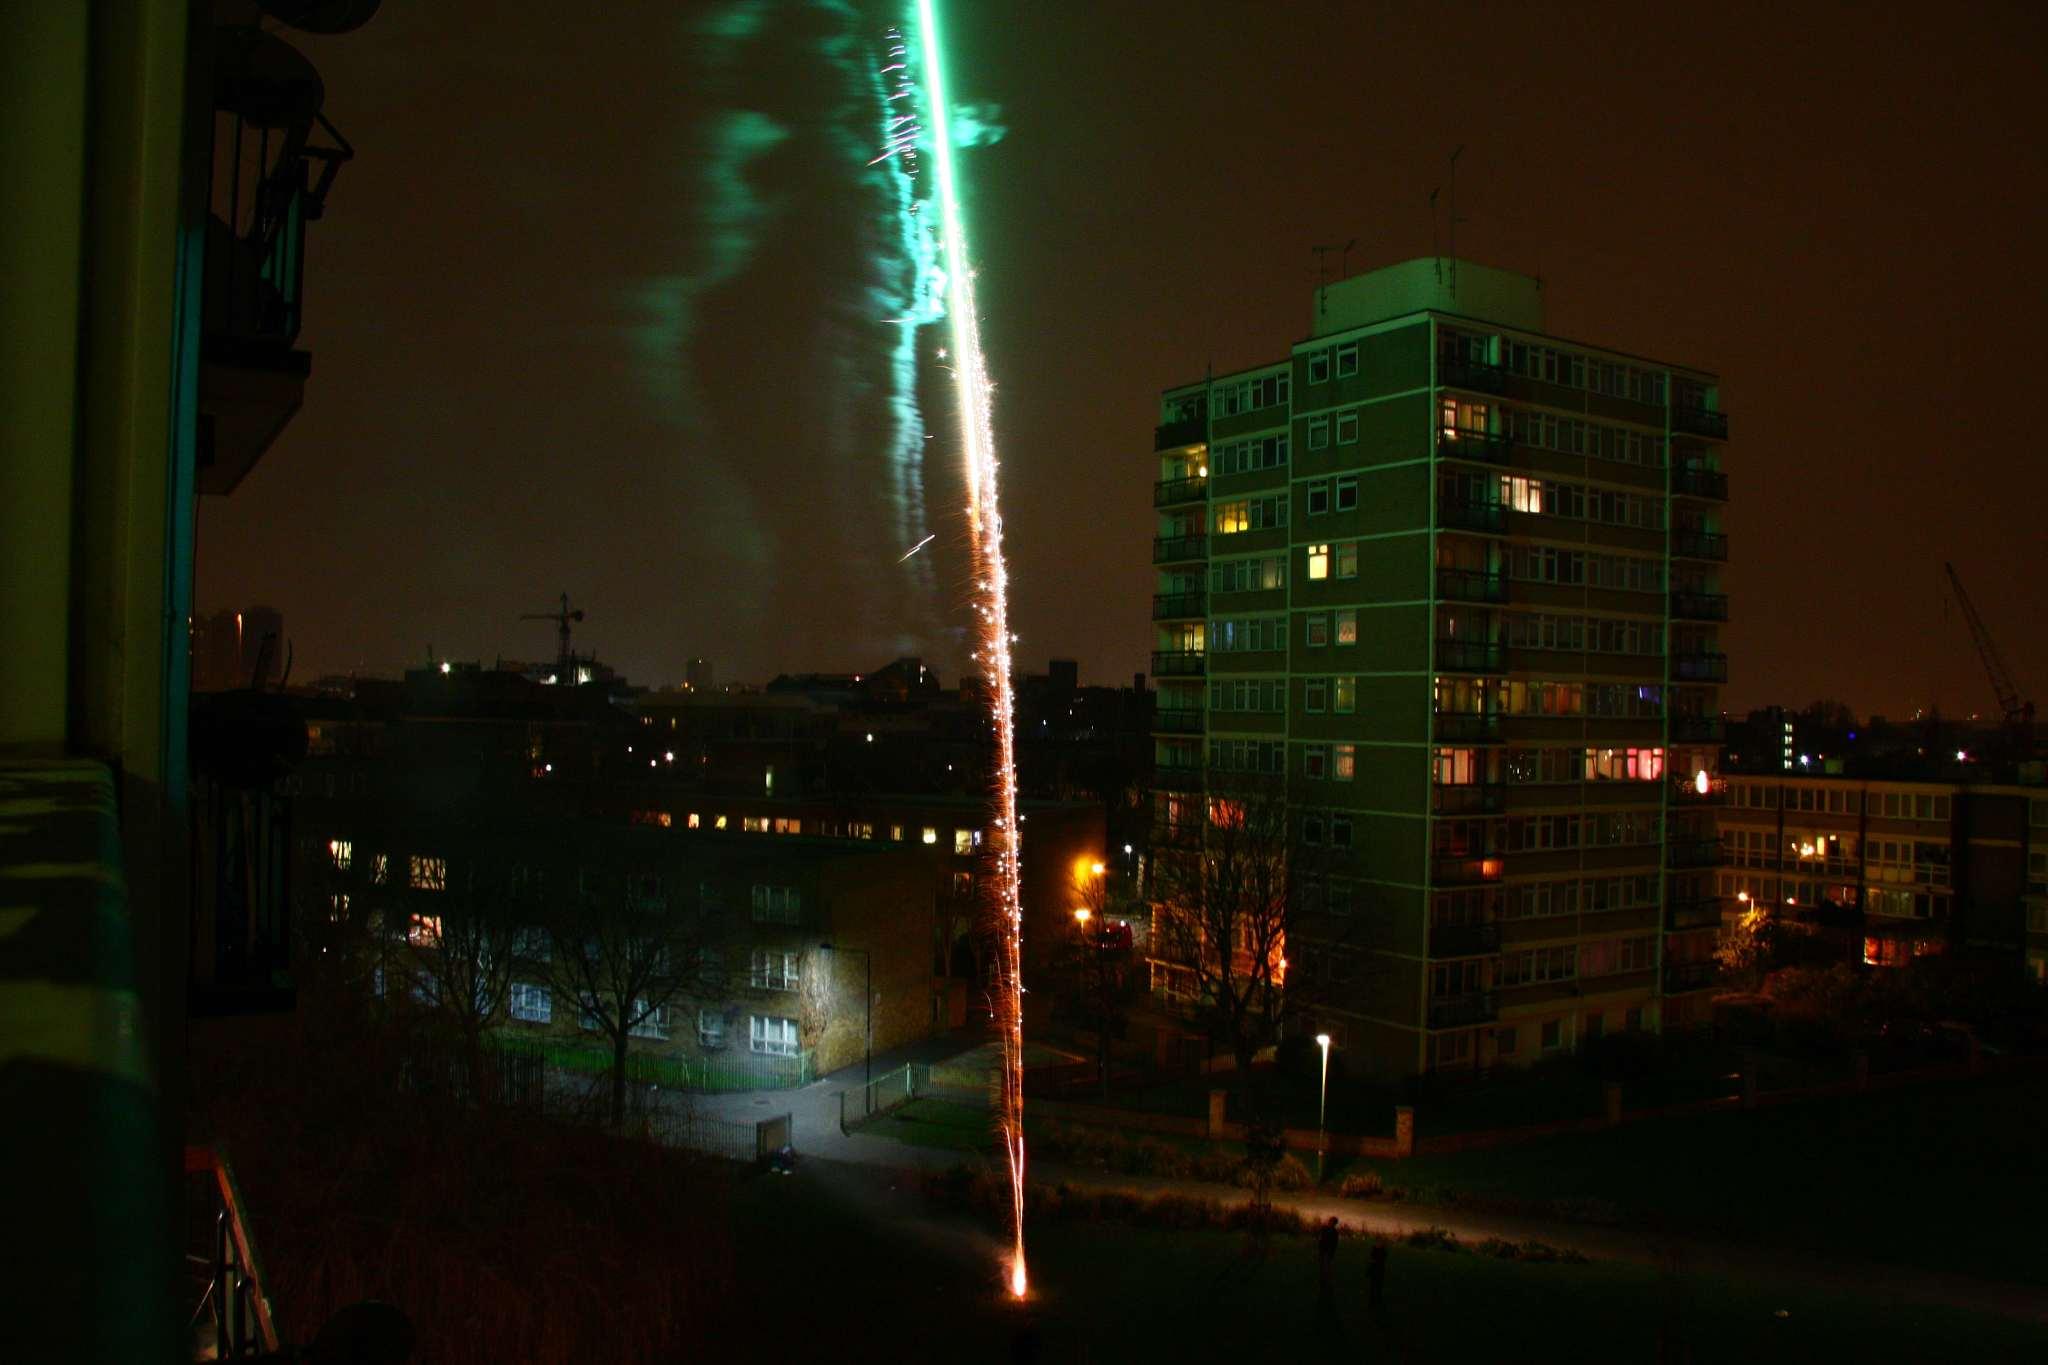 Fireworks over Poplar